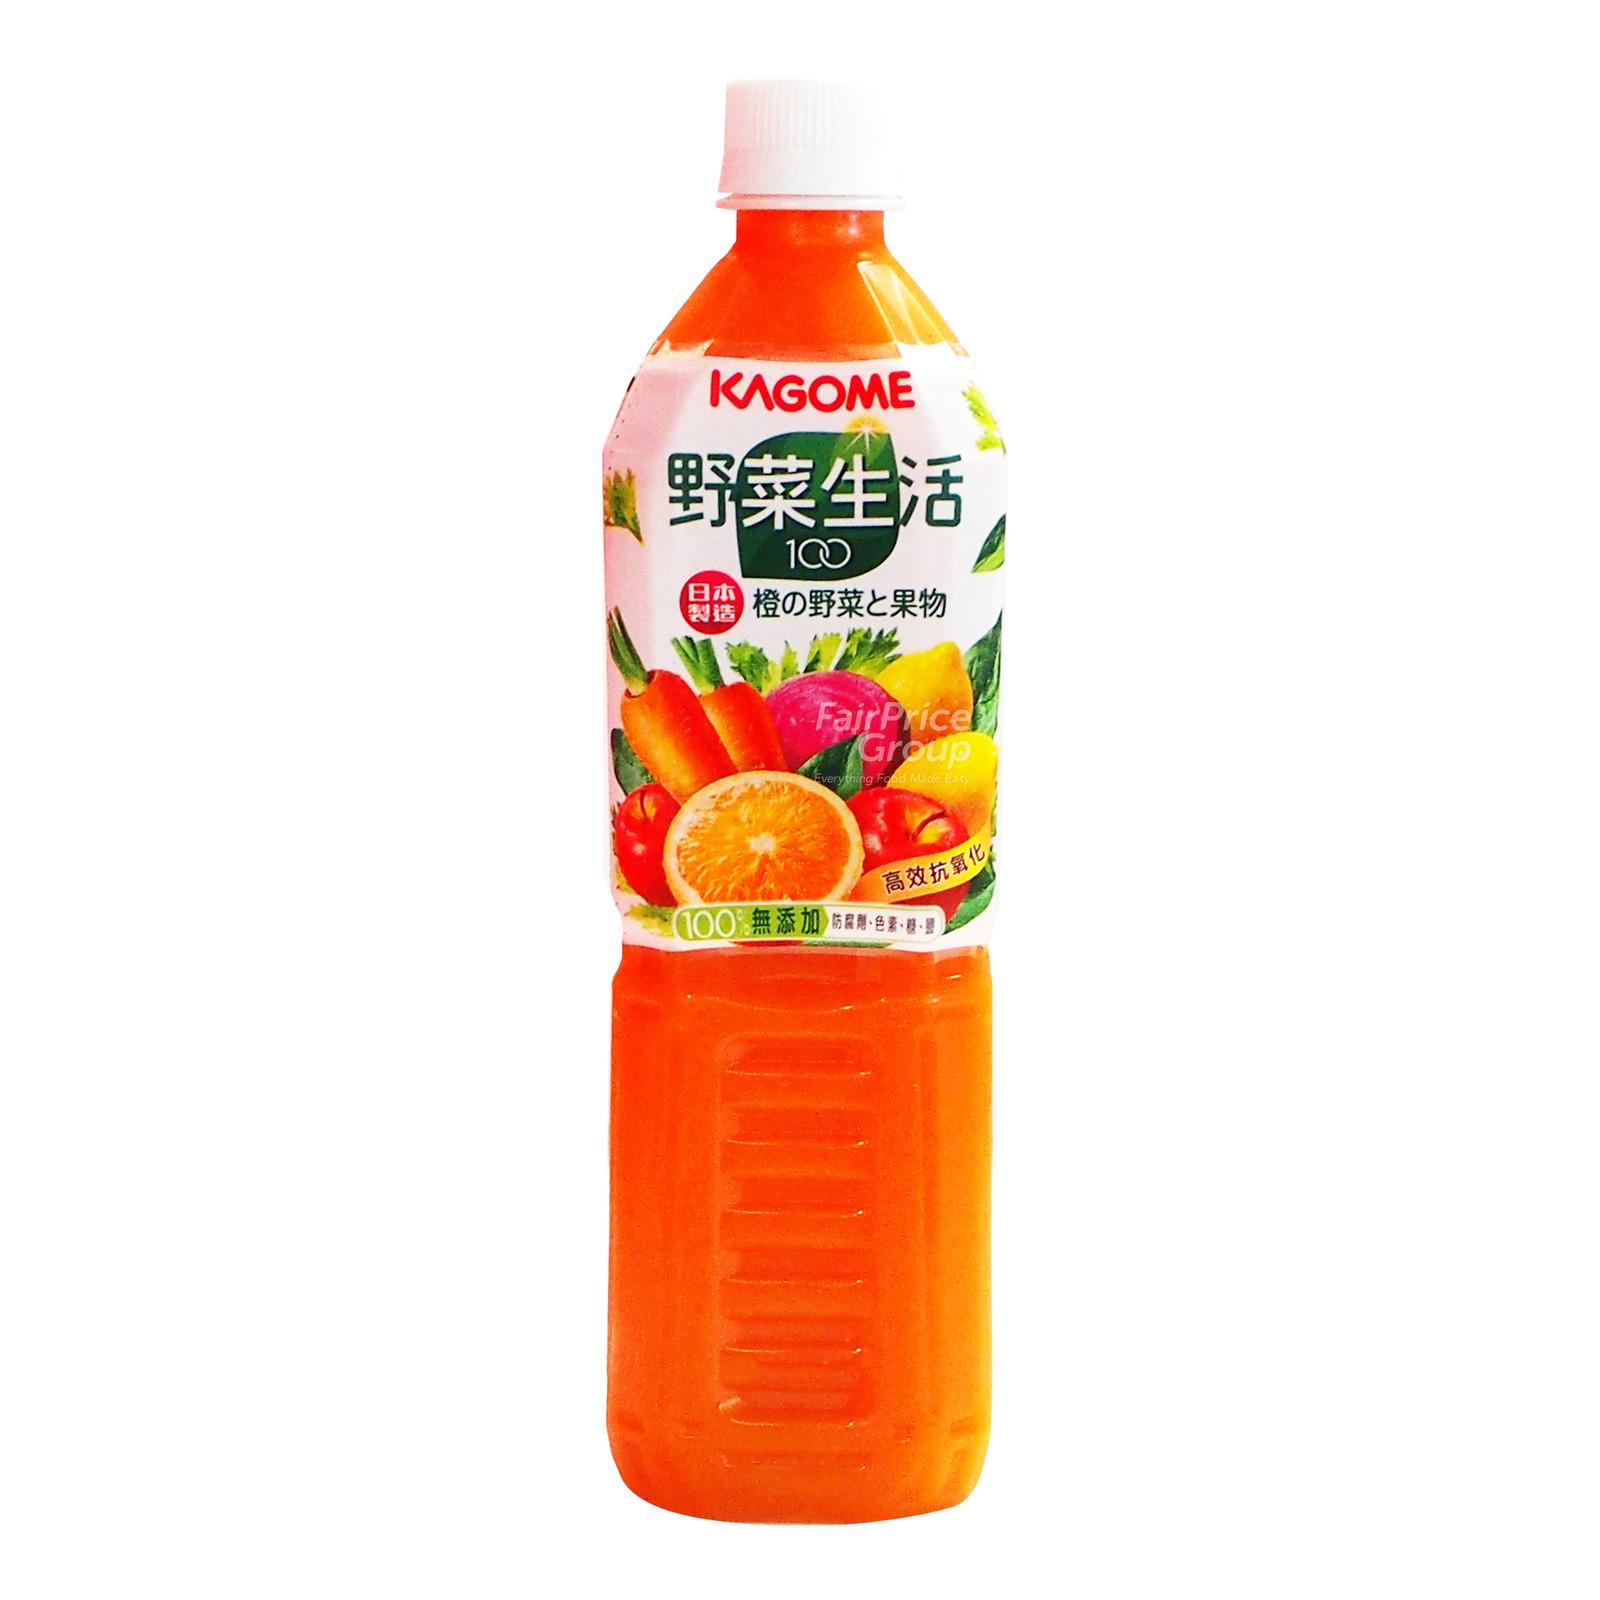 Kagome Bottle Juice - Mixed Fruits & Vegetables